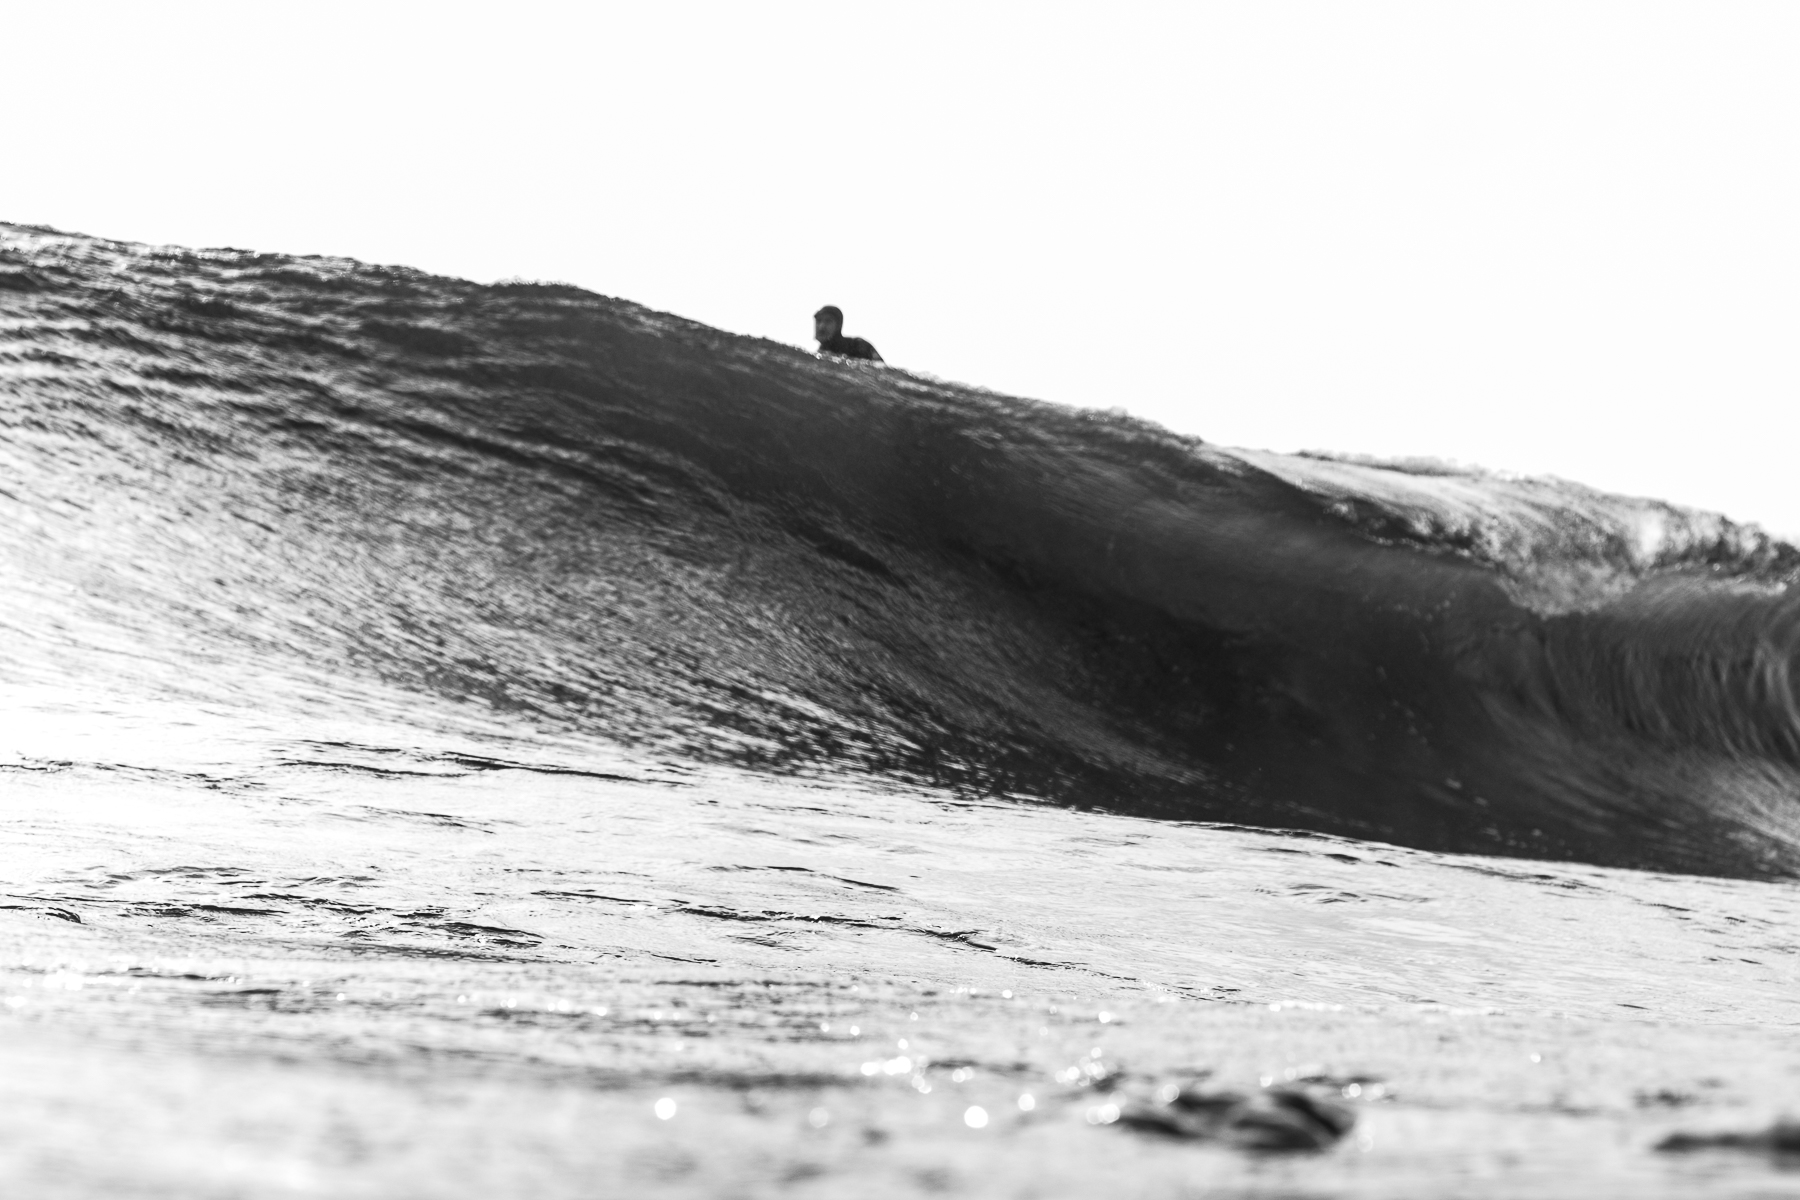 tofino_surf_photography-over_the_edge.jpg